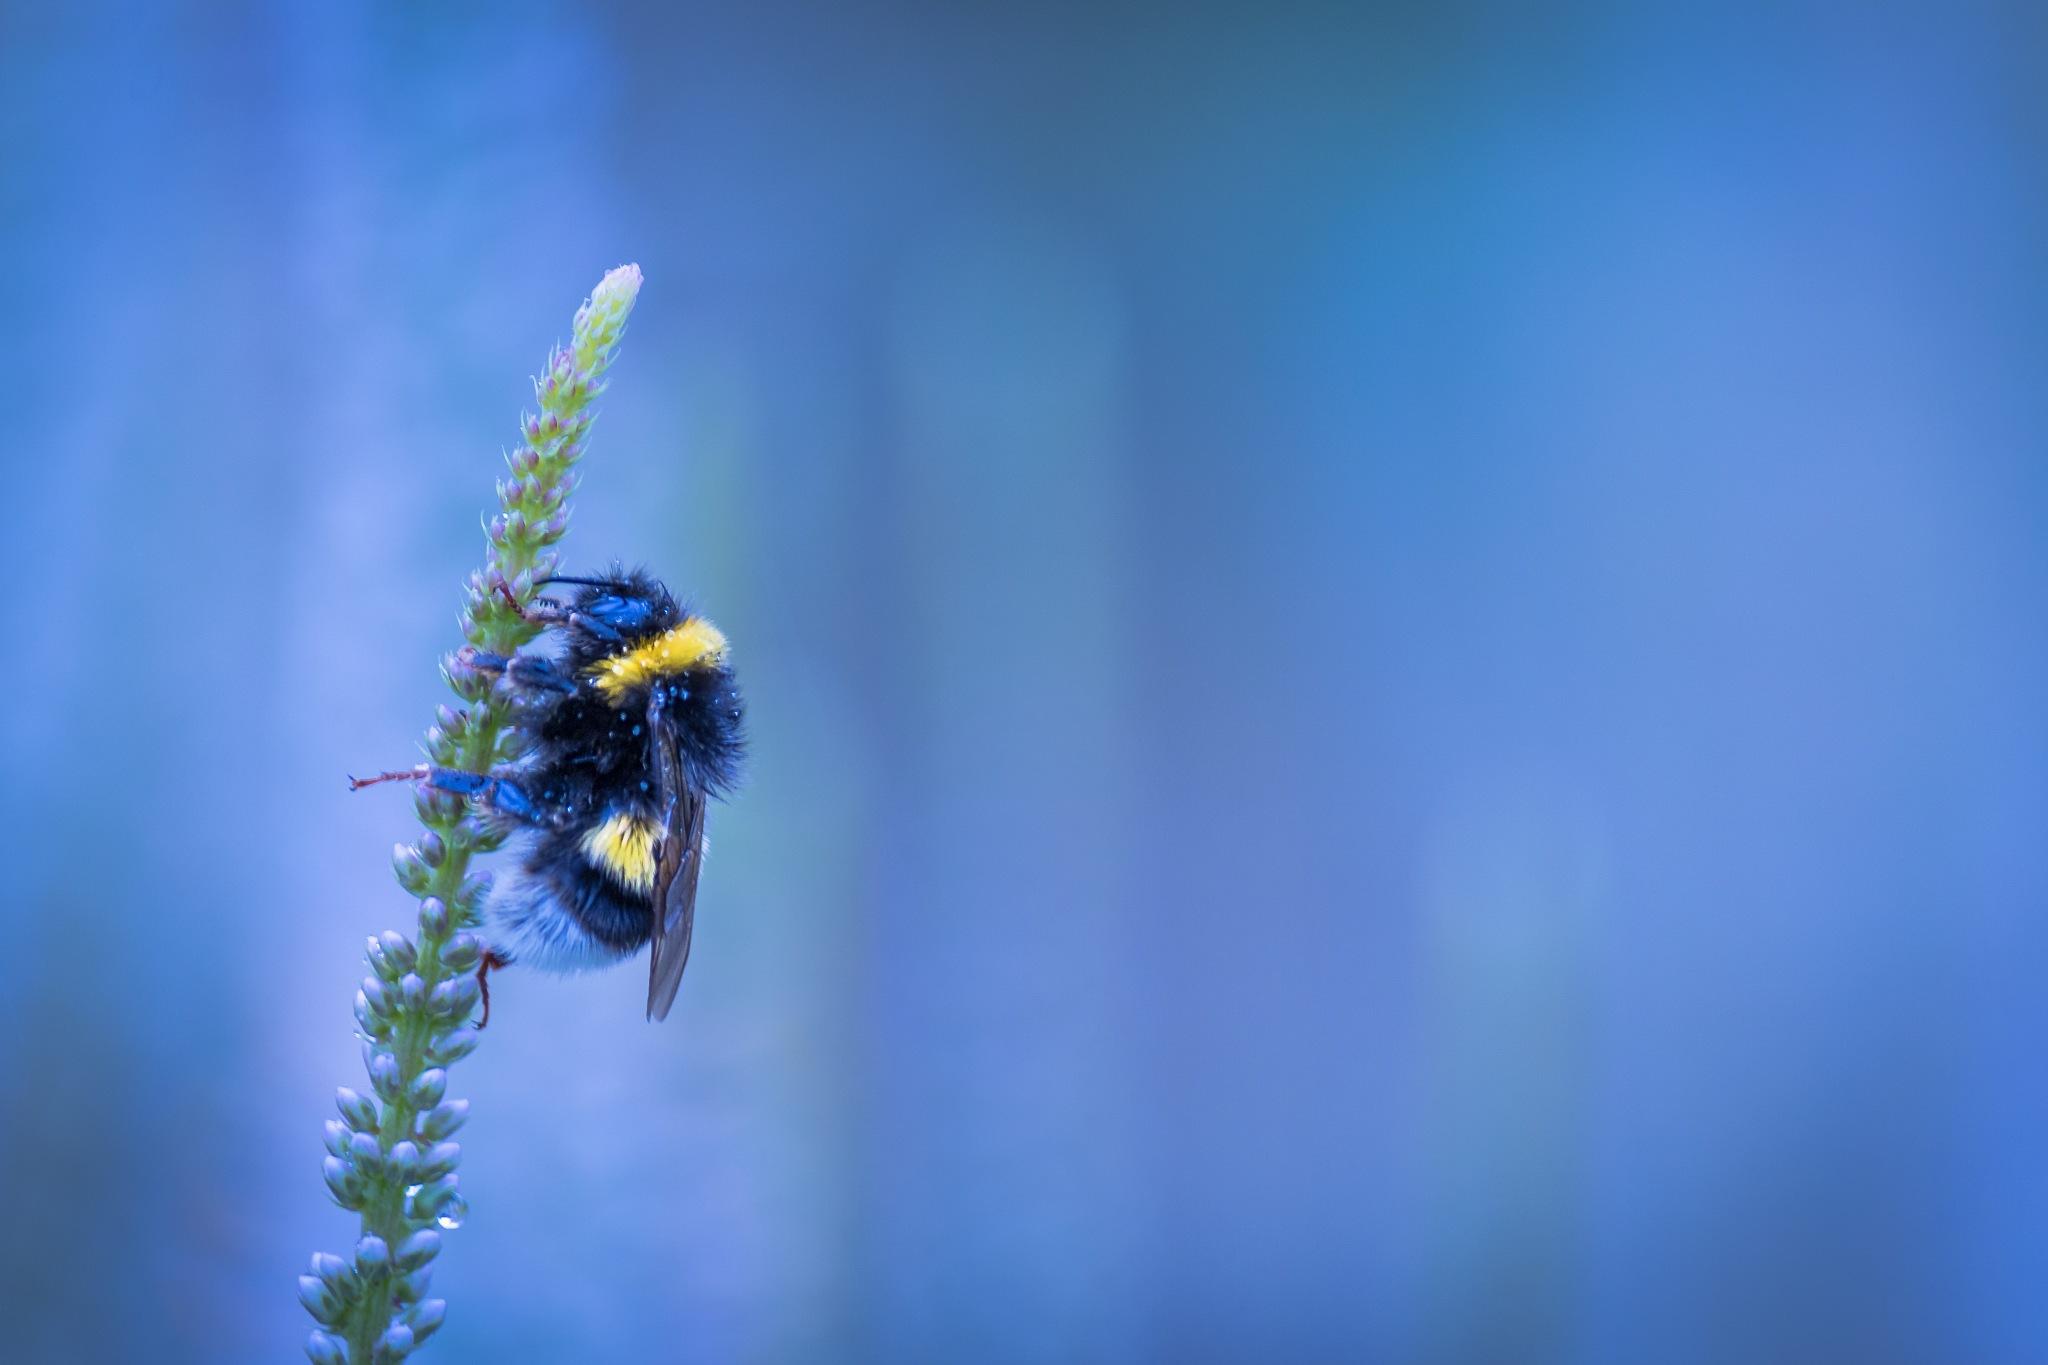 Bumblebee by Mirza Buljusmic